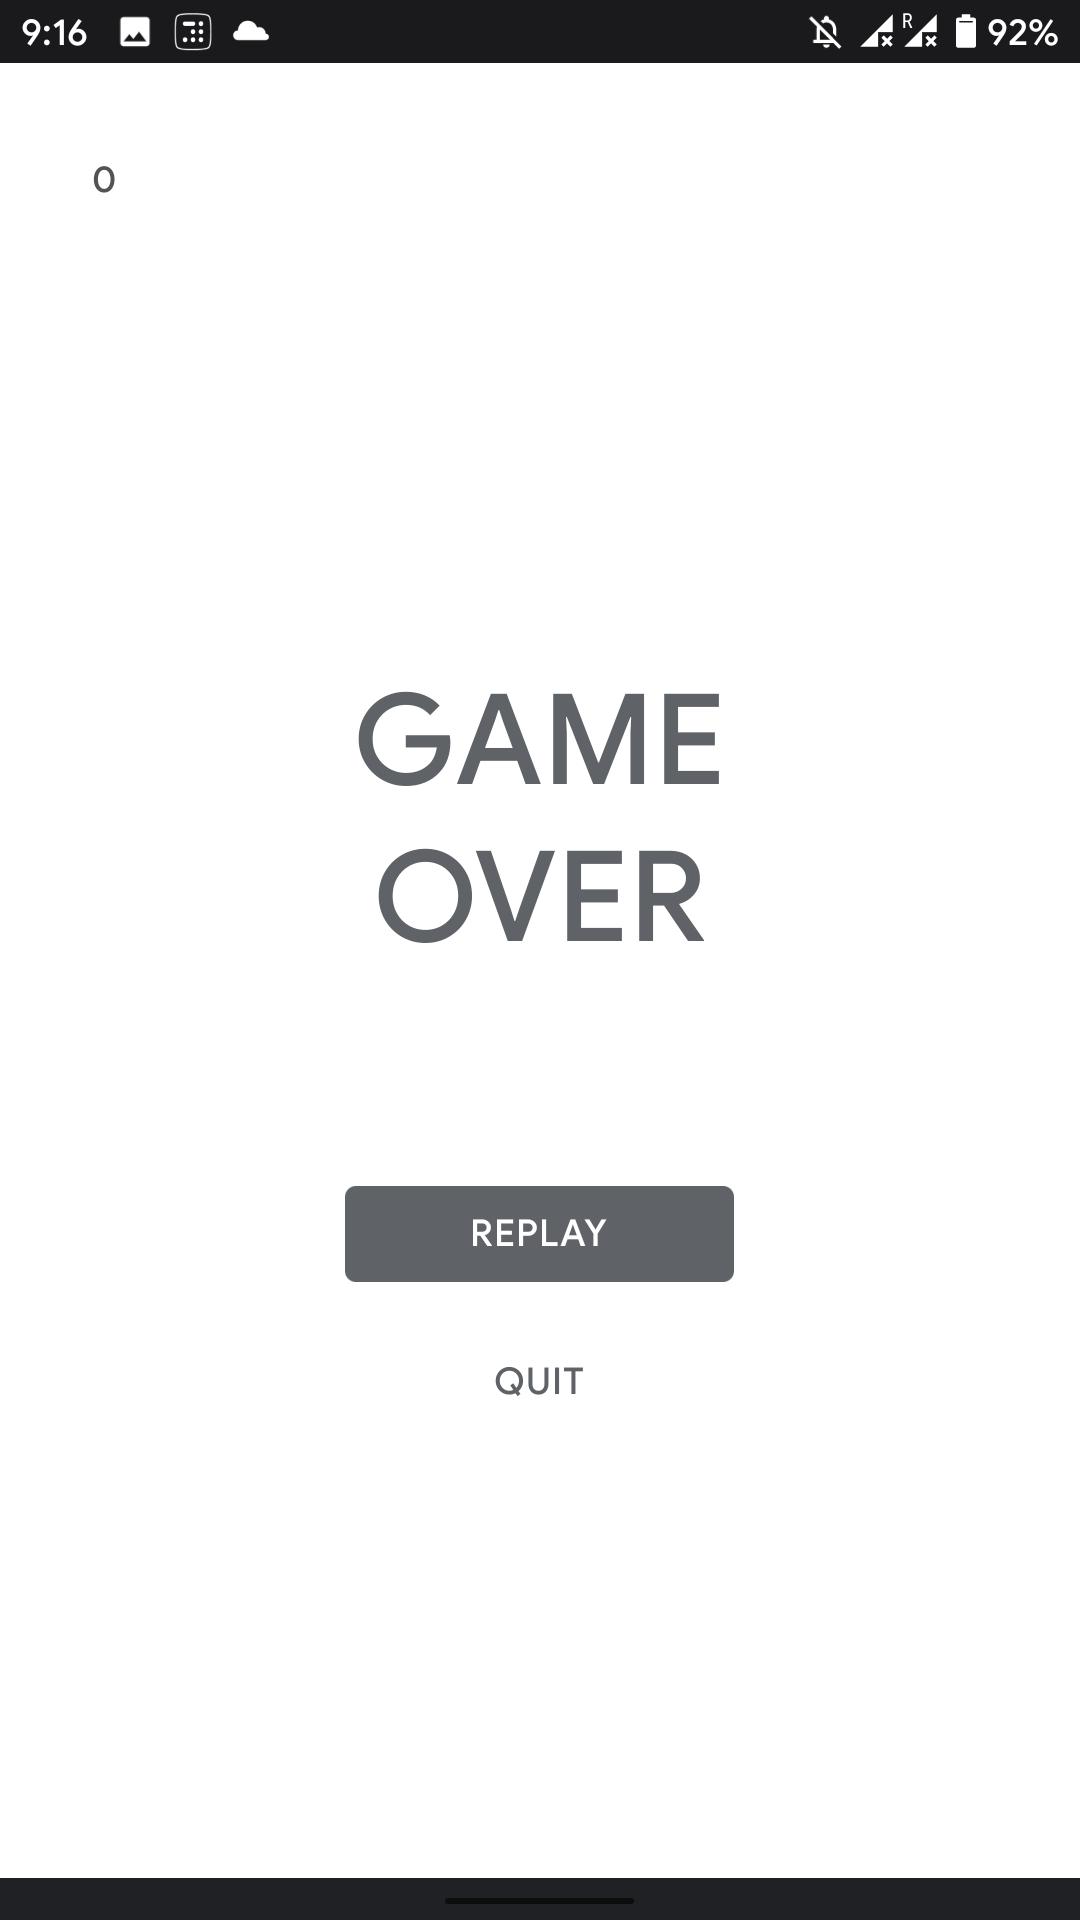 Gra offline Hot Air Balloon w Google Play Store (źródło: Android Police)